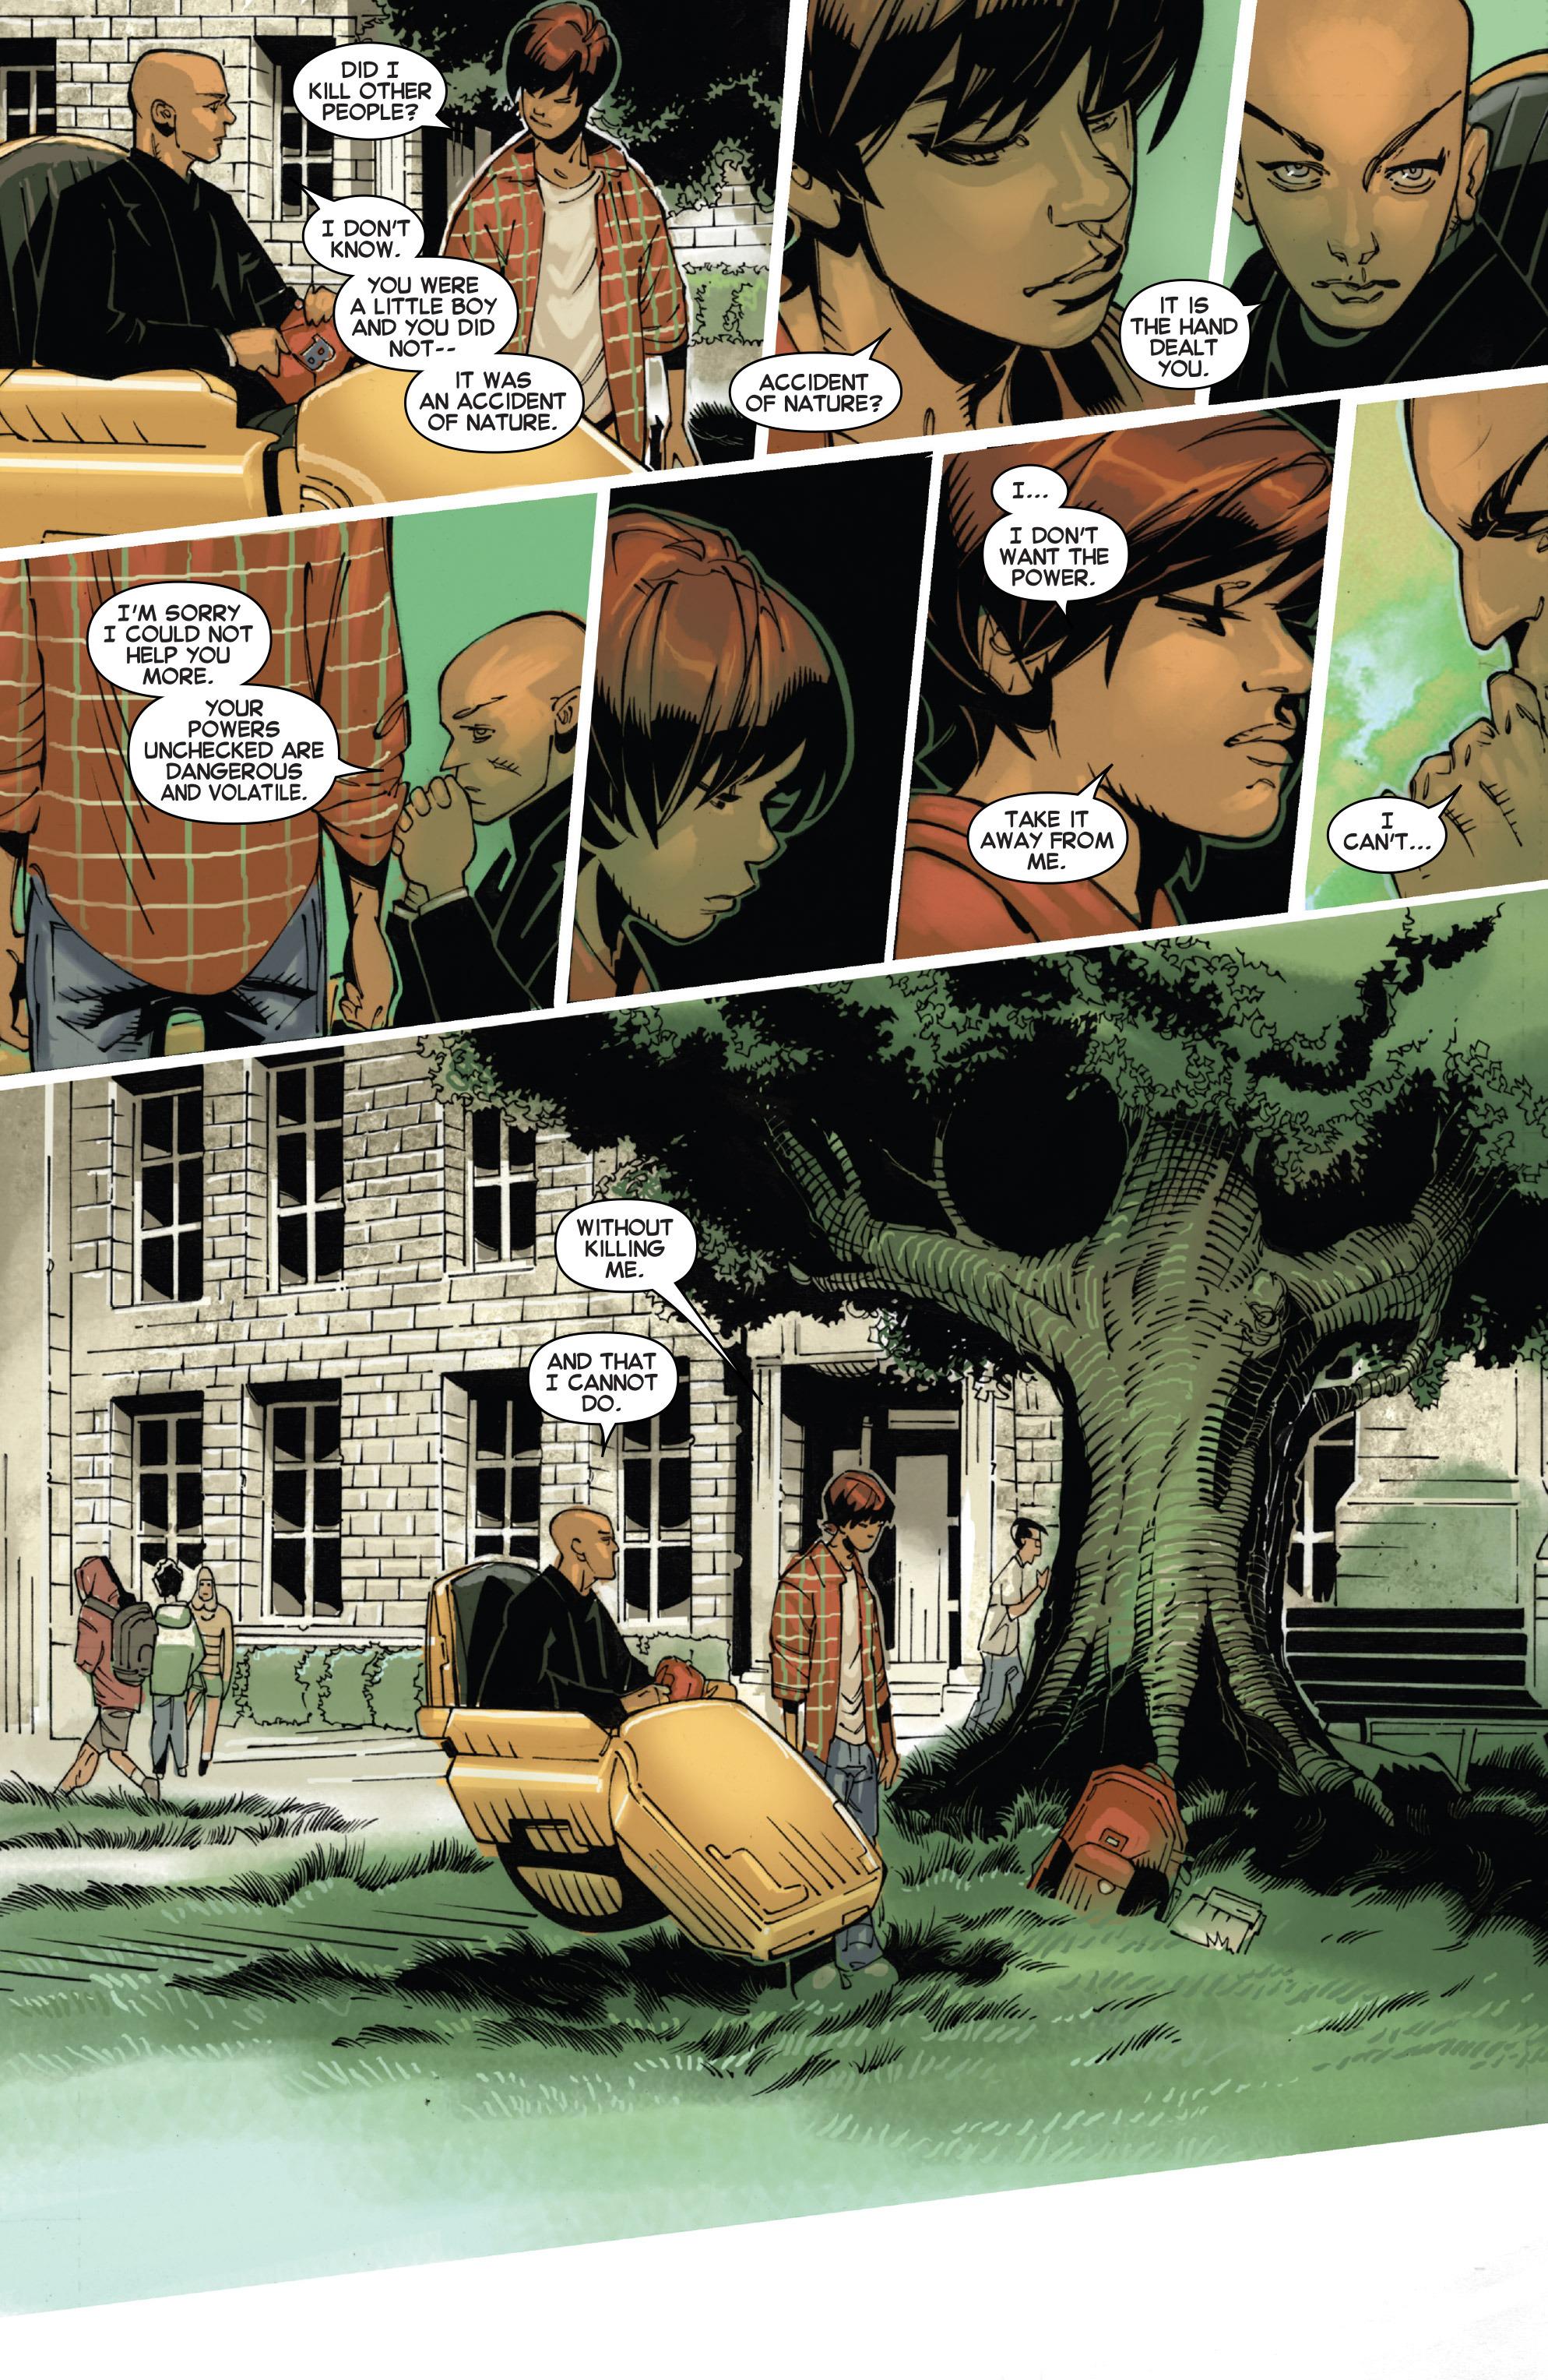 Read online Uncanny X-Men (2013) comic -  Issue # _TPB 4 - vs. S.H.I.E.L.D - 140